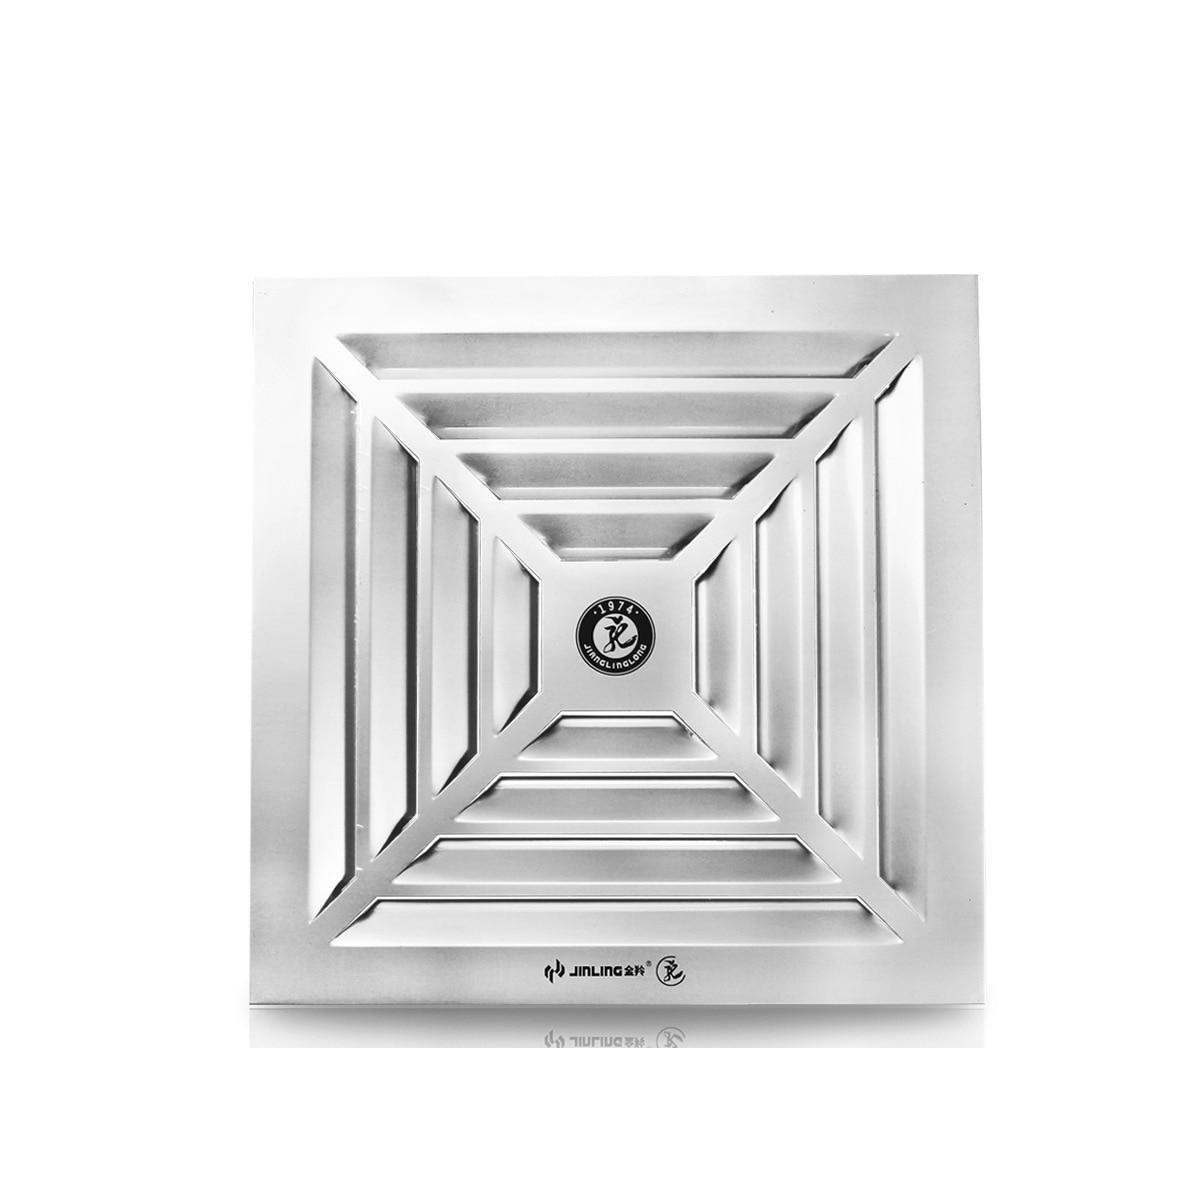 Integrated ceiling fan 12 inch aluminum buckle fan bathroom exhaust fan remove TVOC HCHO PM2.5 tvoc tvoc tvoc